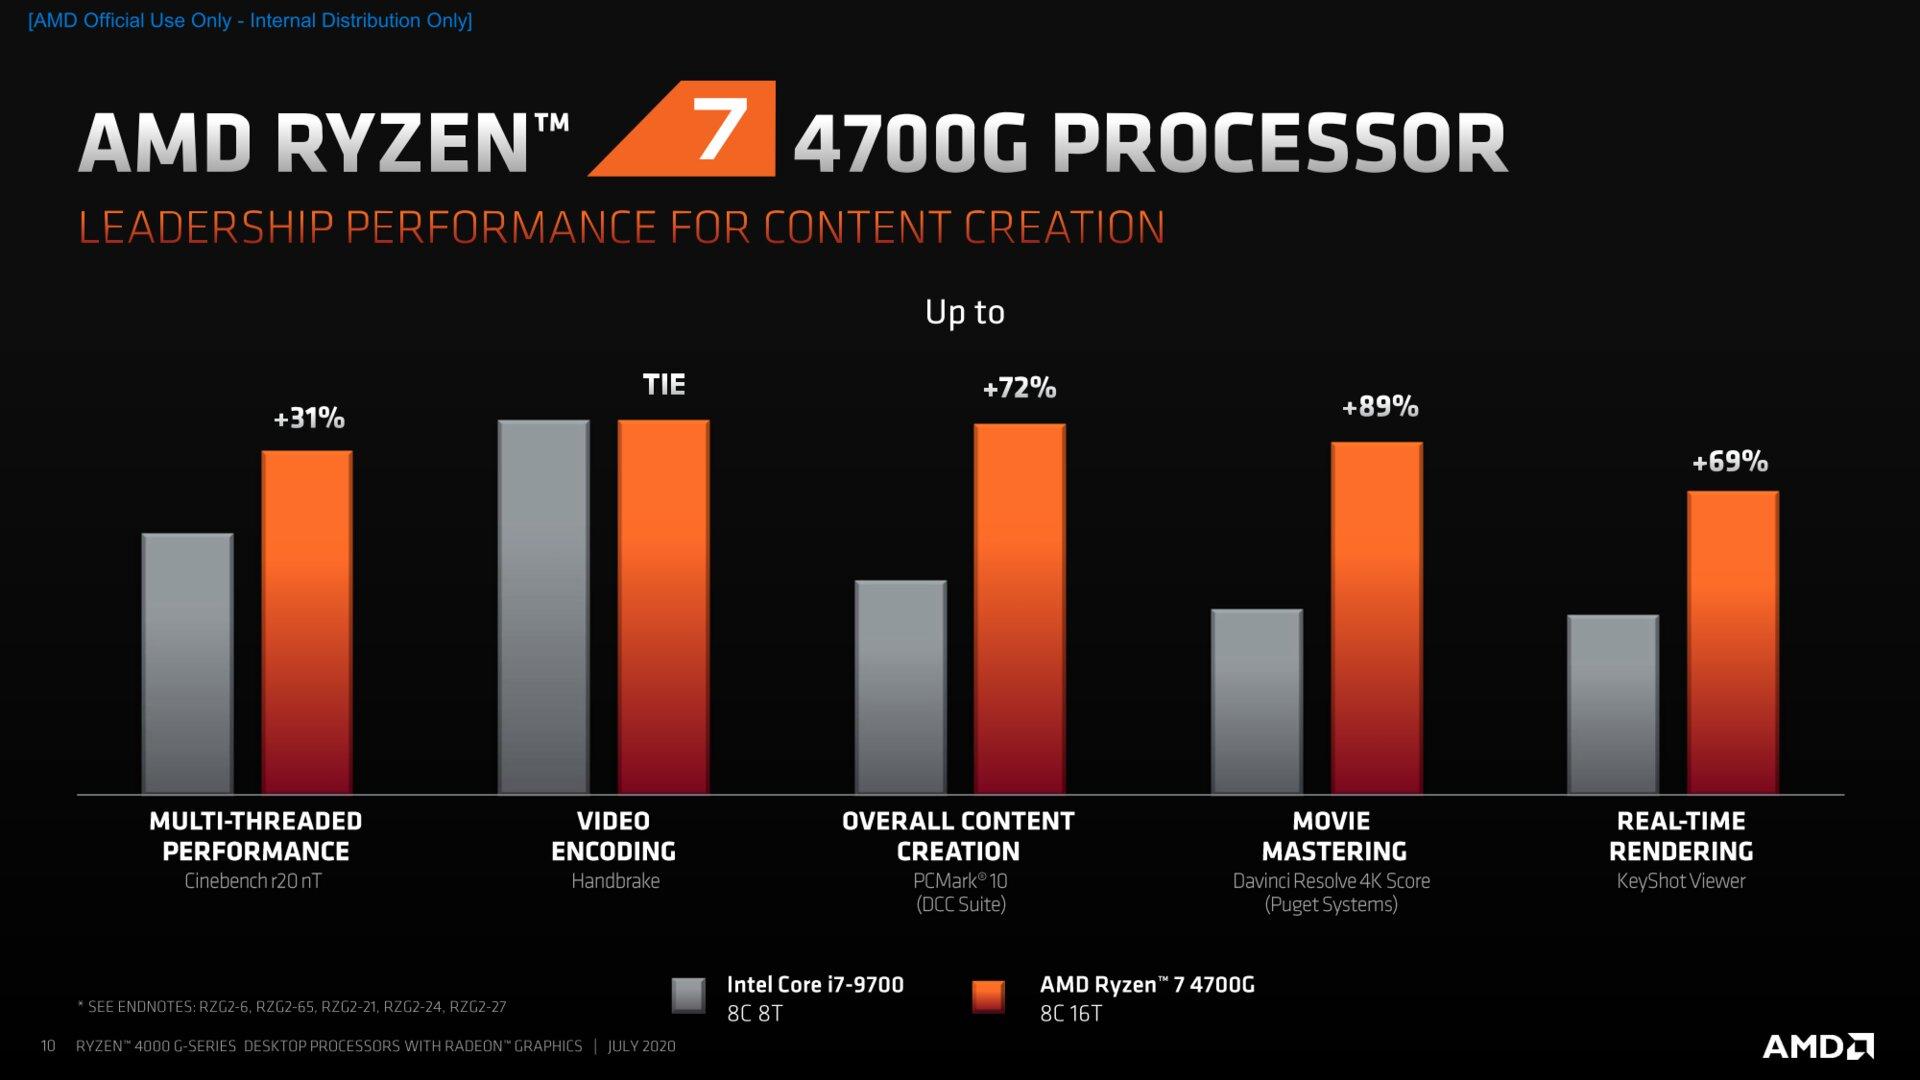 Ryzen 7 4700G Benchmarks